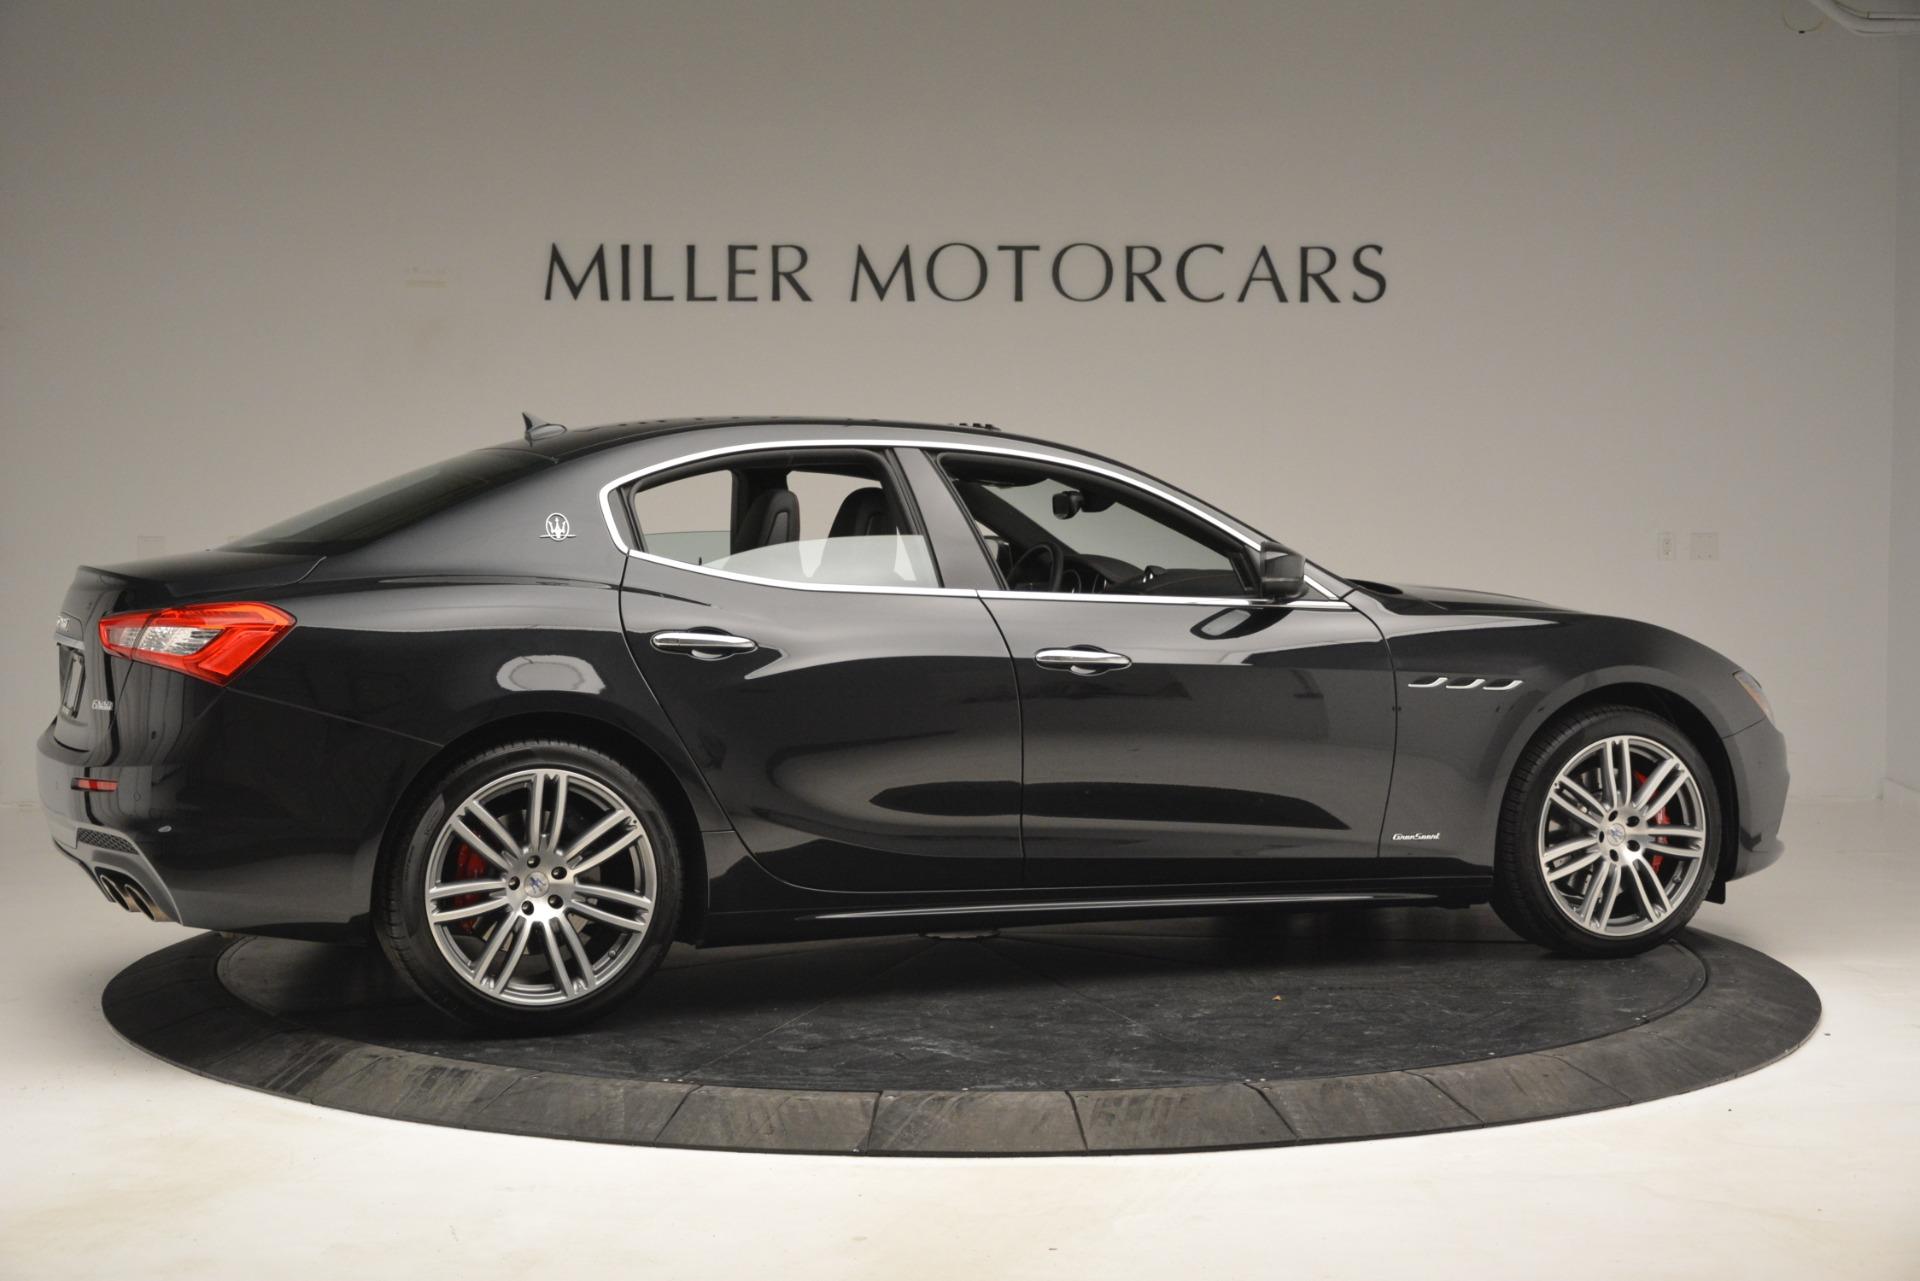 New 2019 Maserati Ghibli S Q4 GranSport For Sale In Greenwich, CT 2614_p9